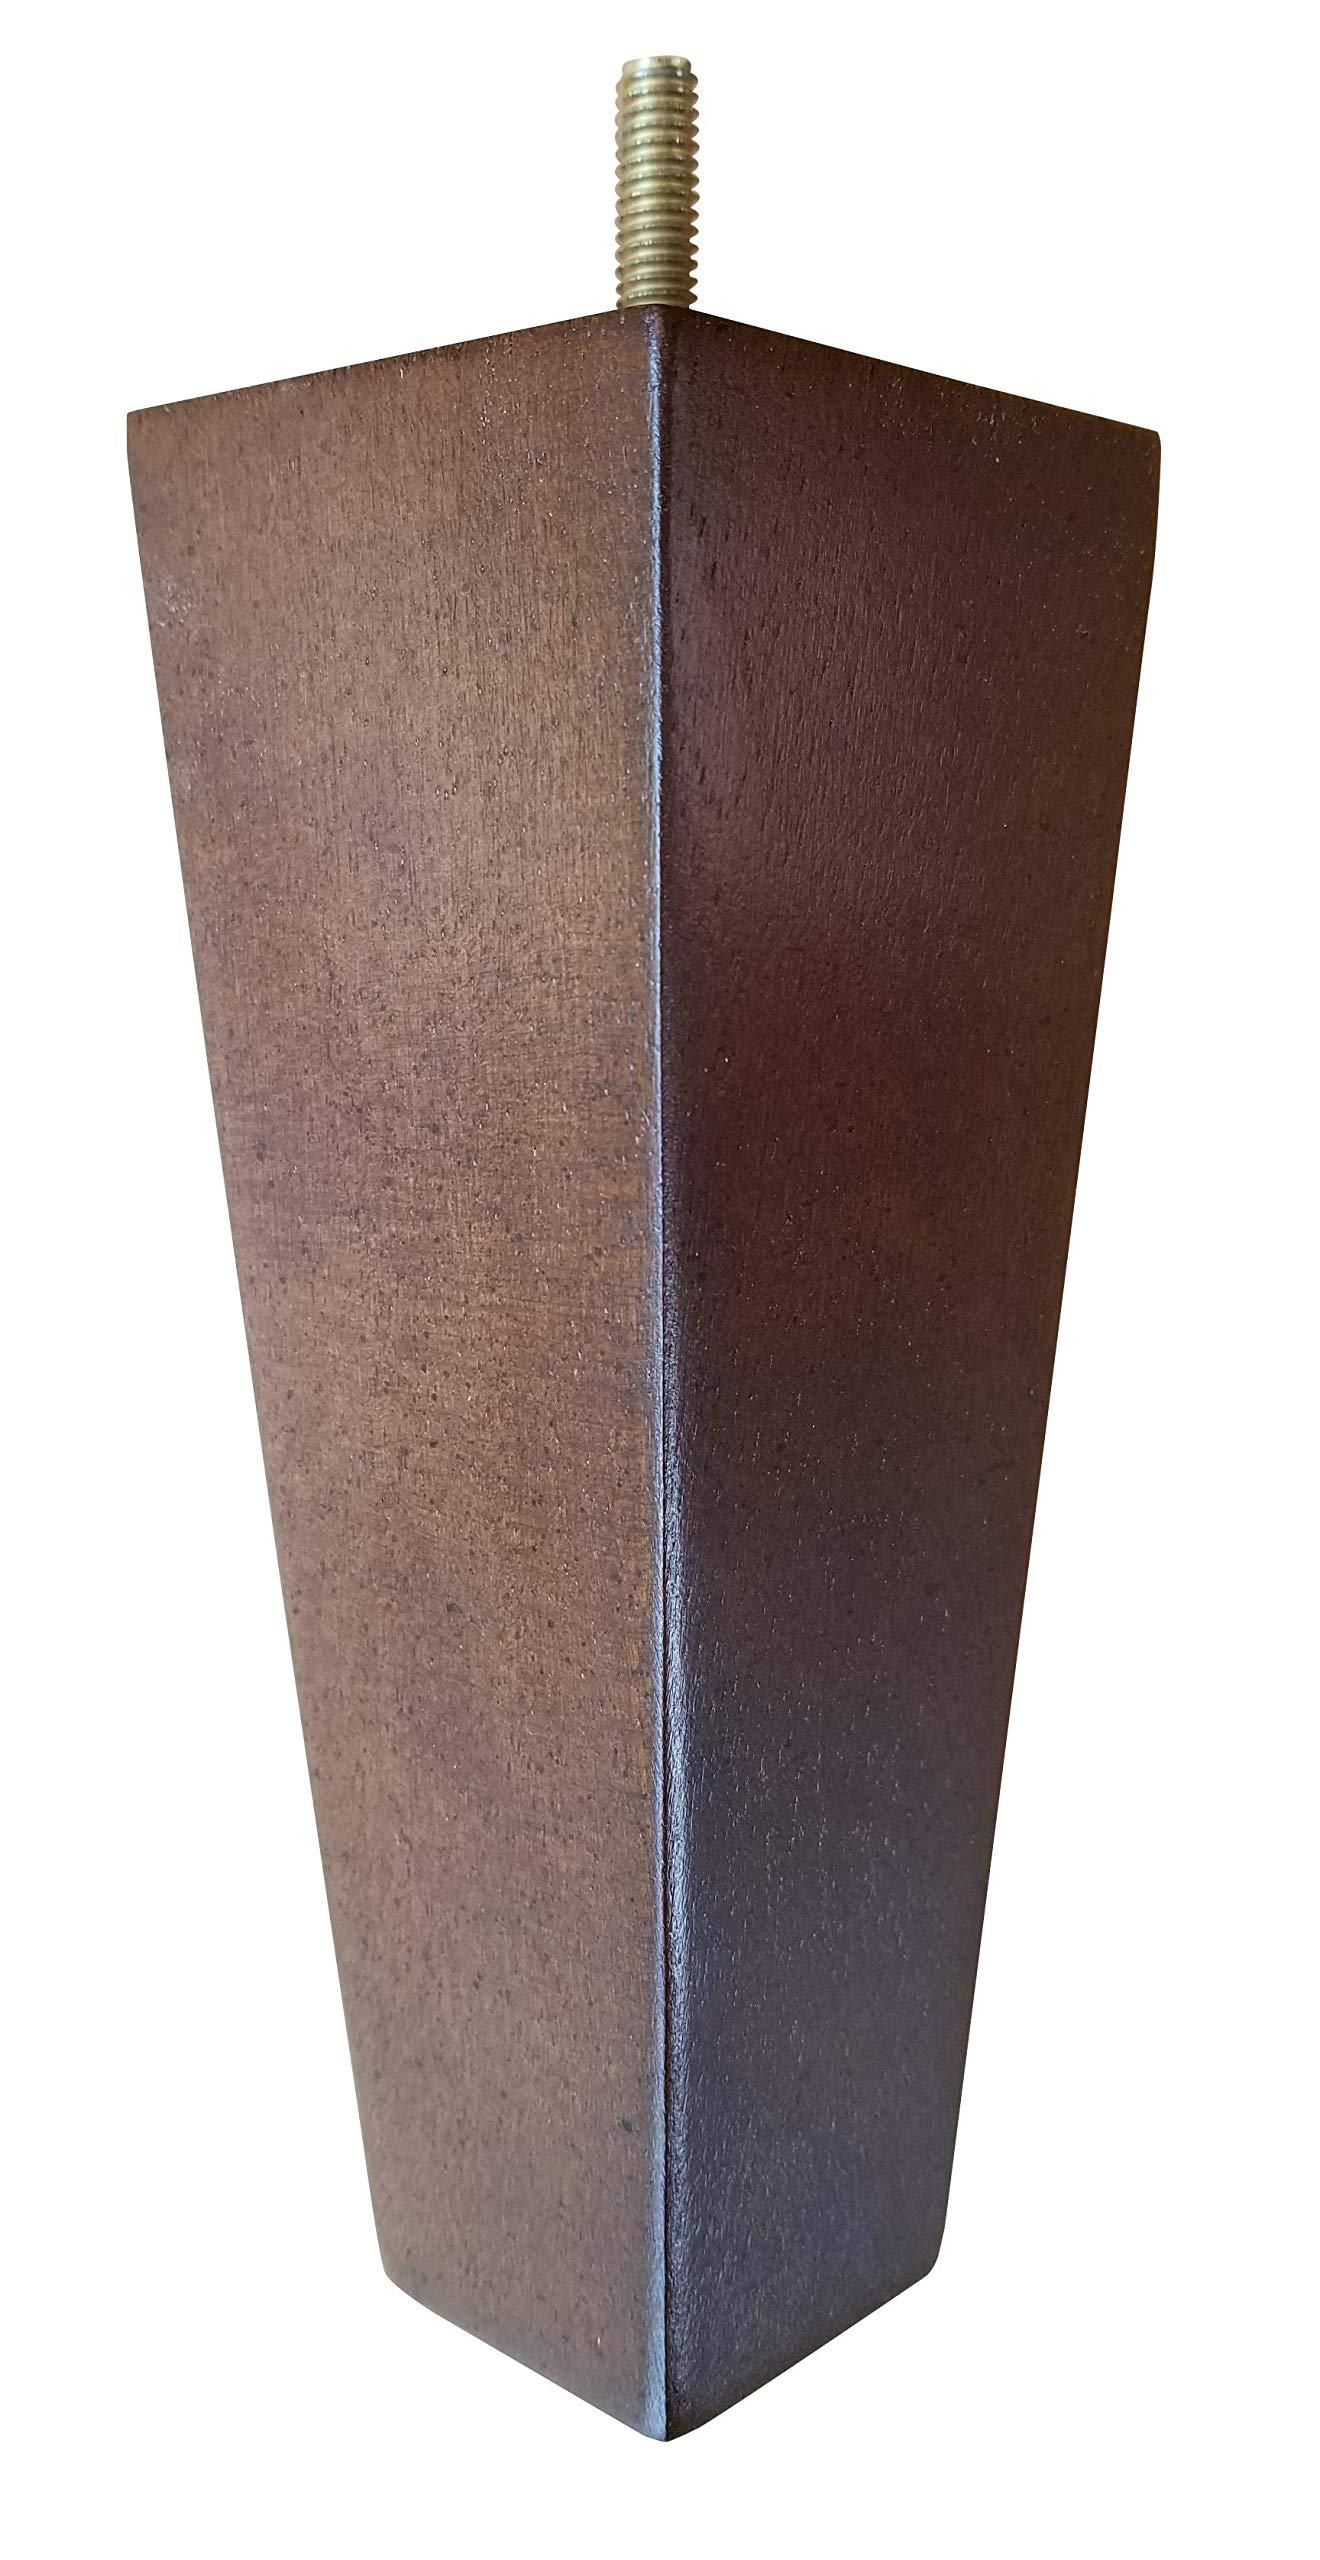 Design 59 inc- Tapered Sofa Legs, Wood, American Walnut Finish - Set of 4